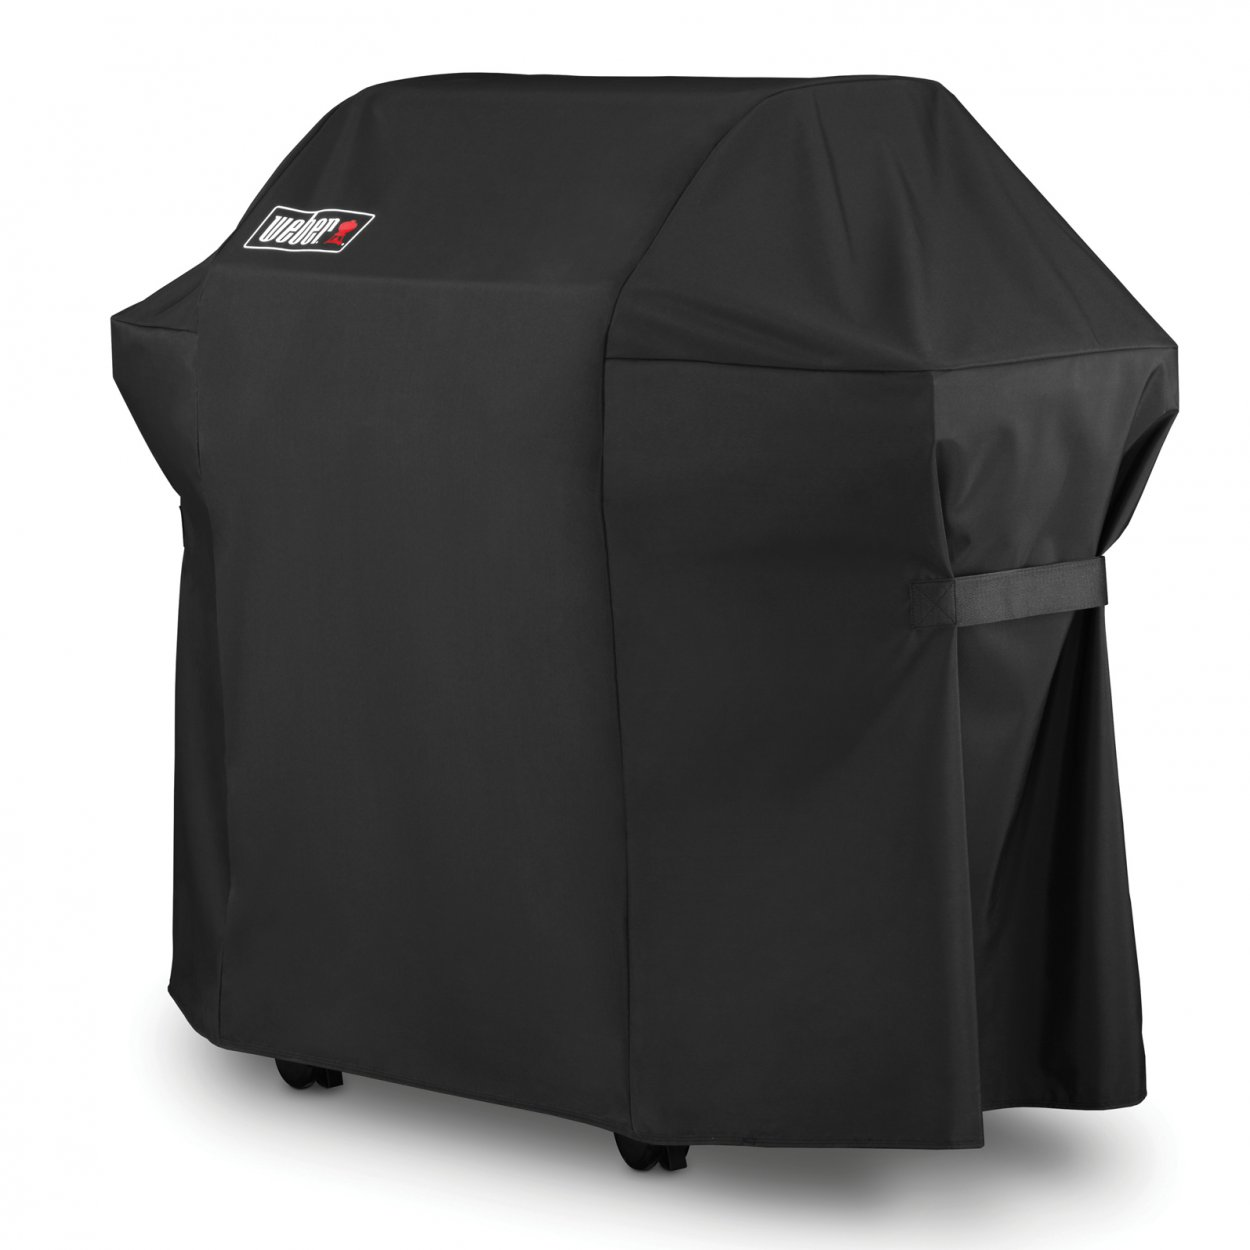 weber gasgrill spirit s 320 gbs premium inklusive. Black Bedroom Furniture Sets. Home Design Ideas